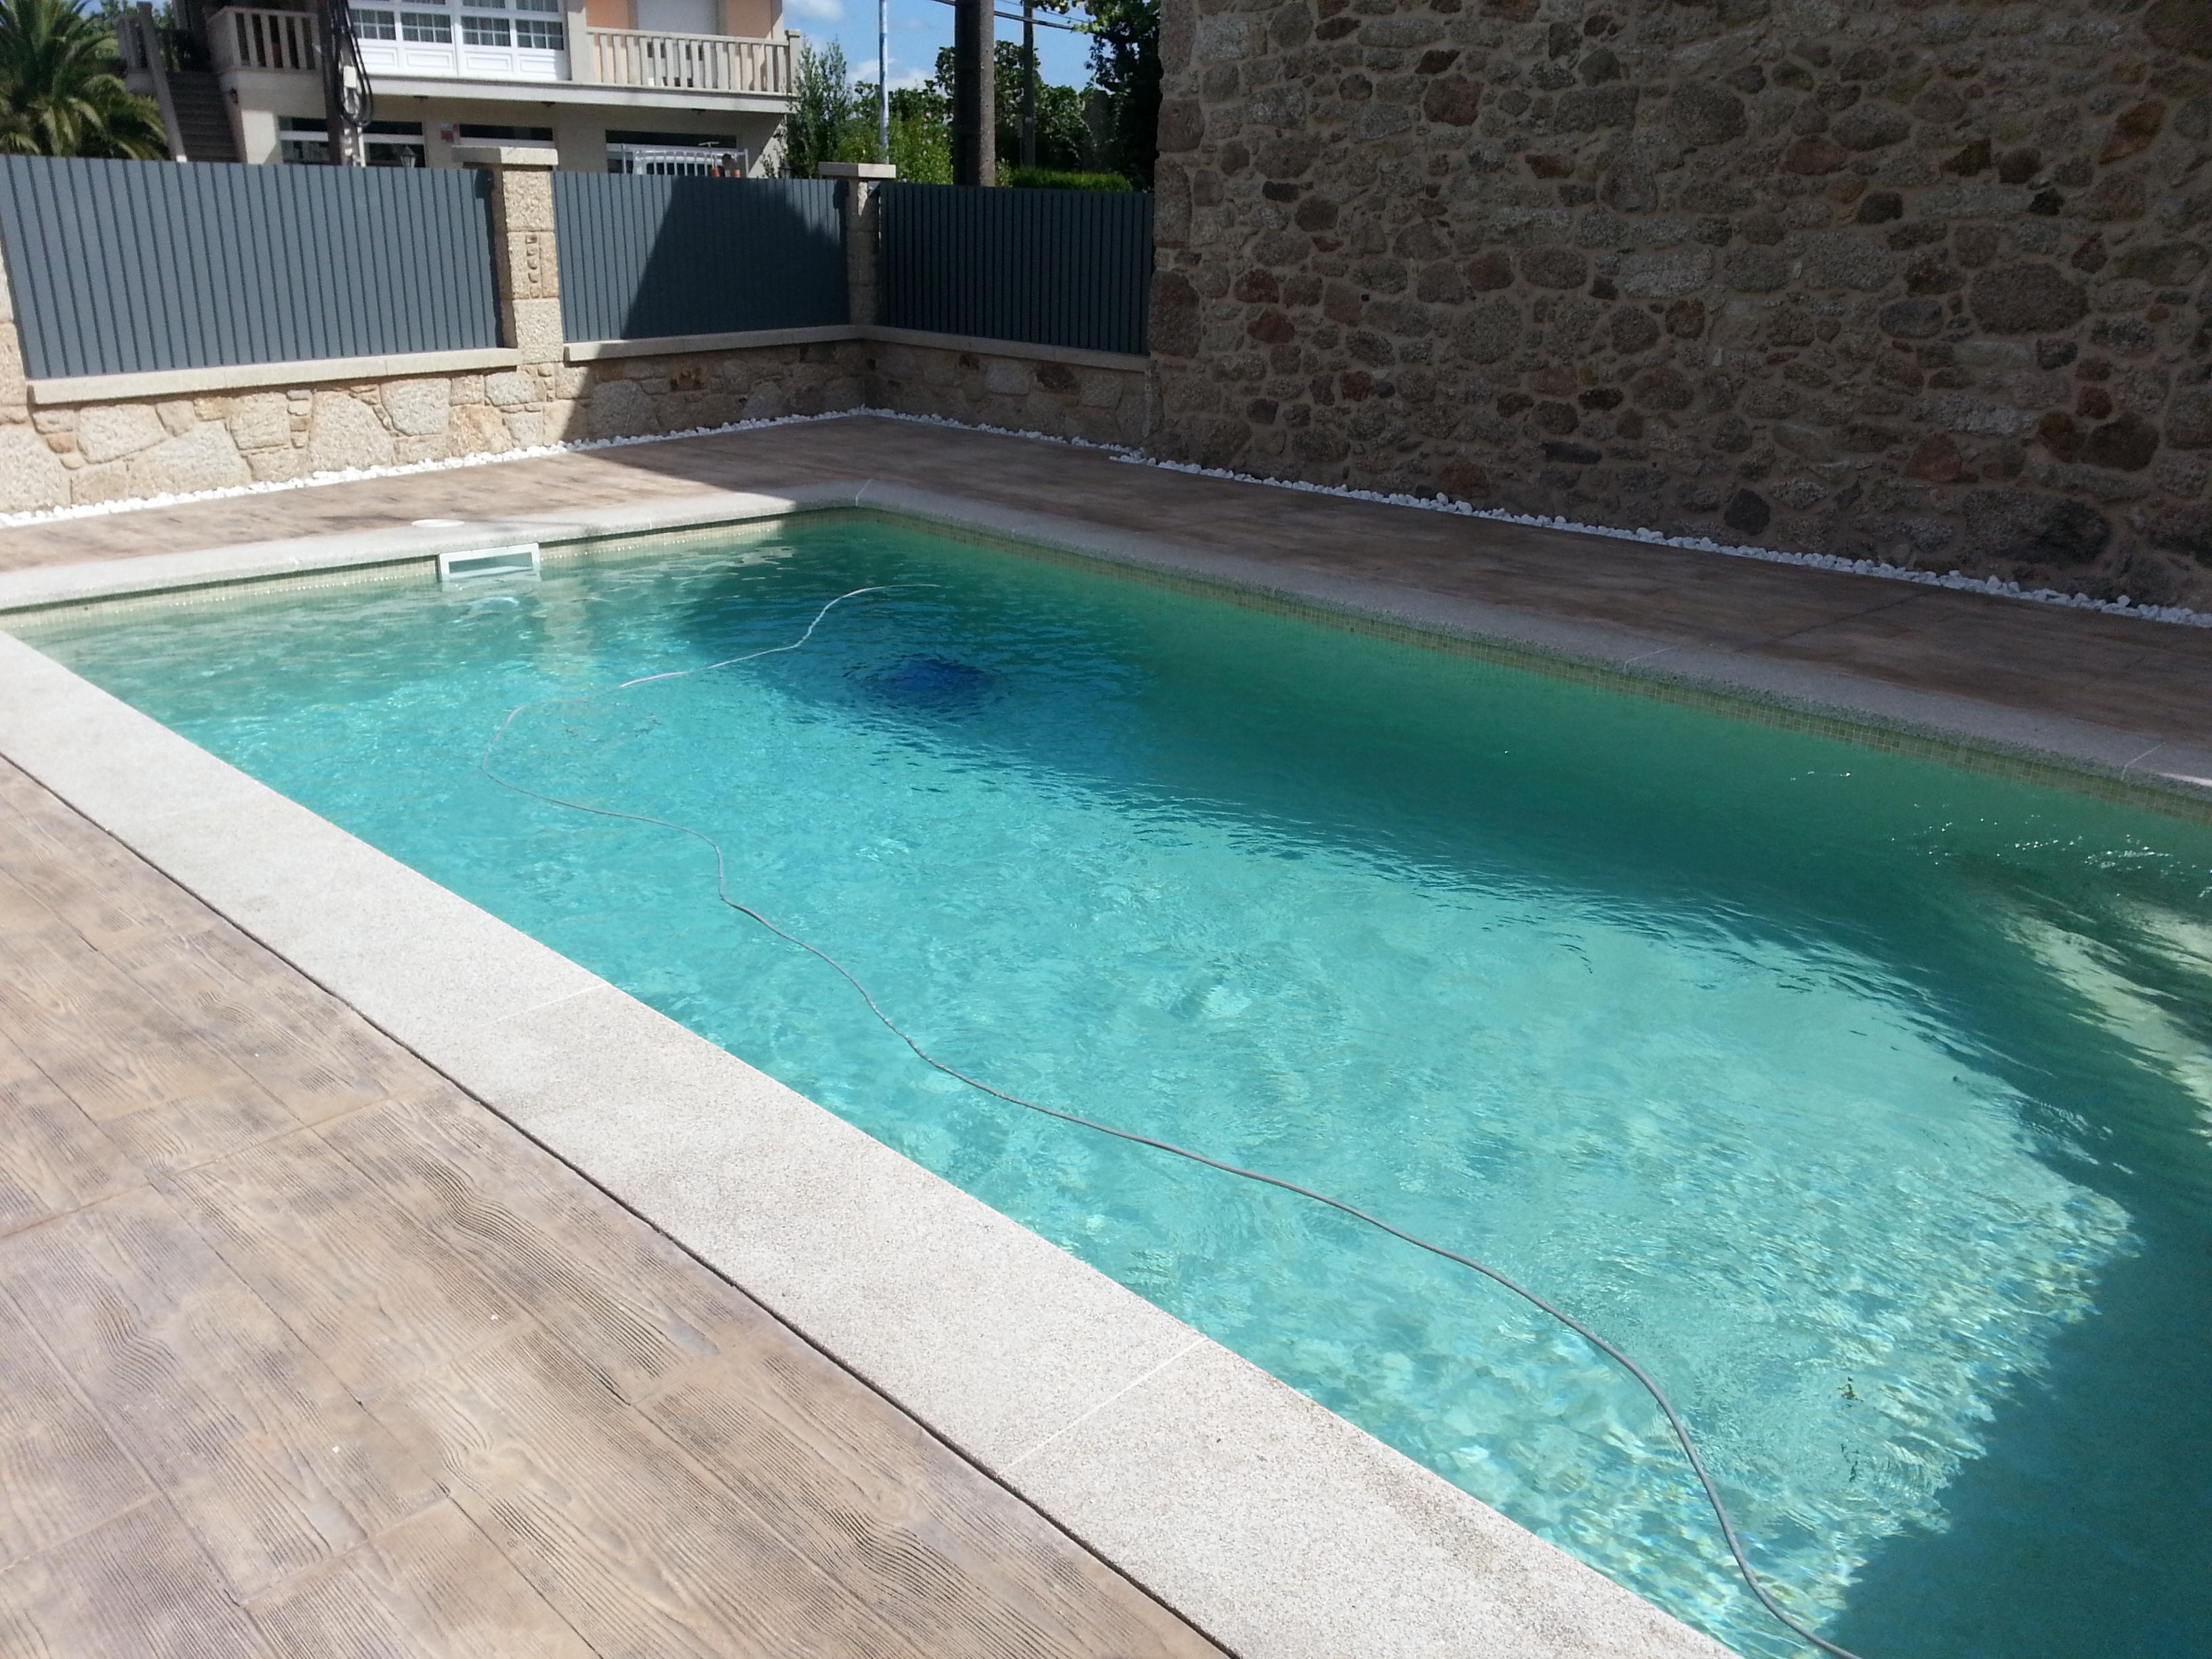 piscina gresite blanco construccin piscinas gresite